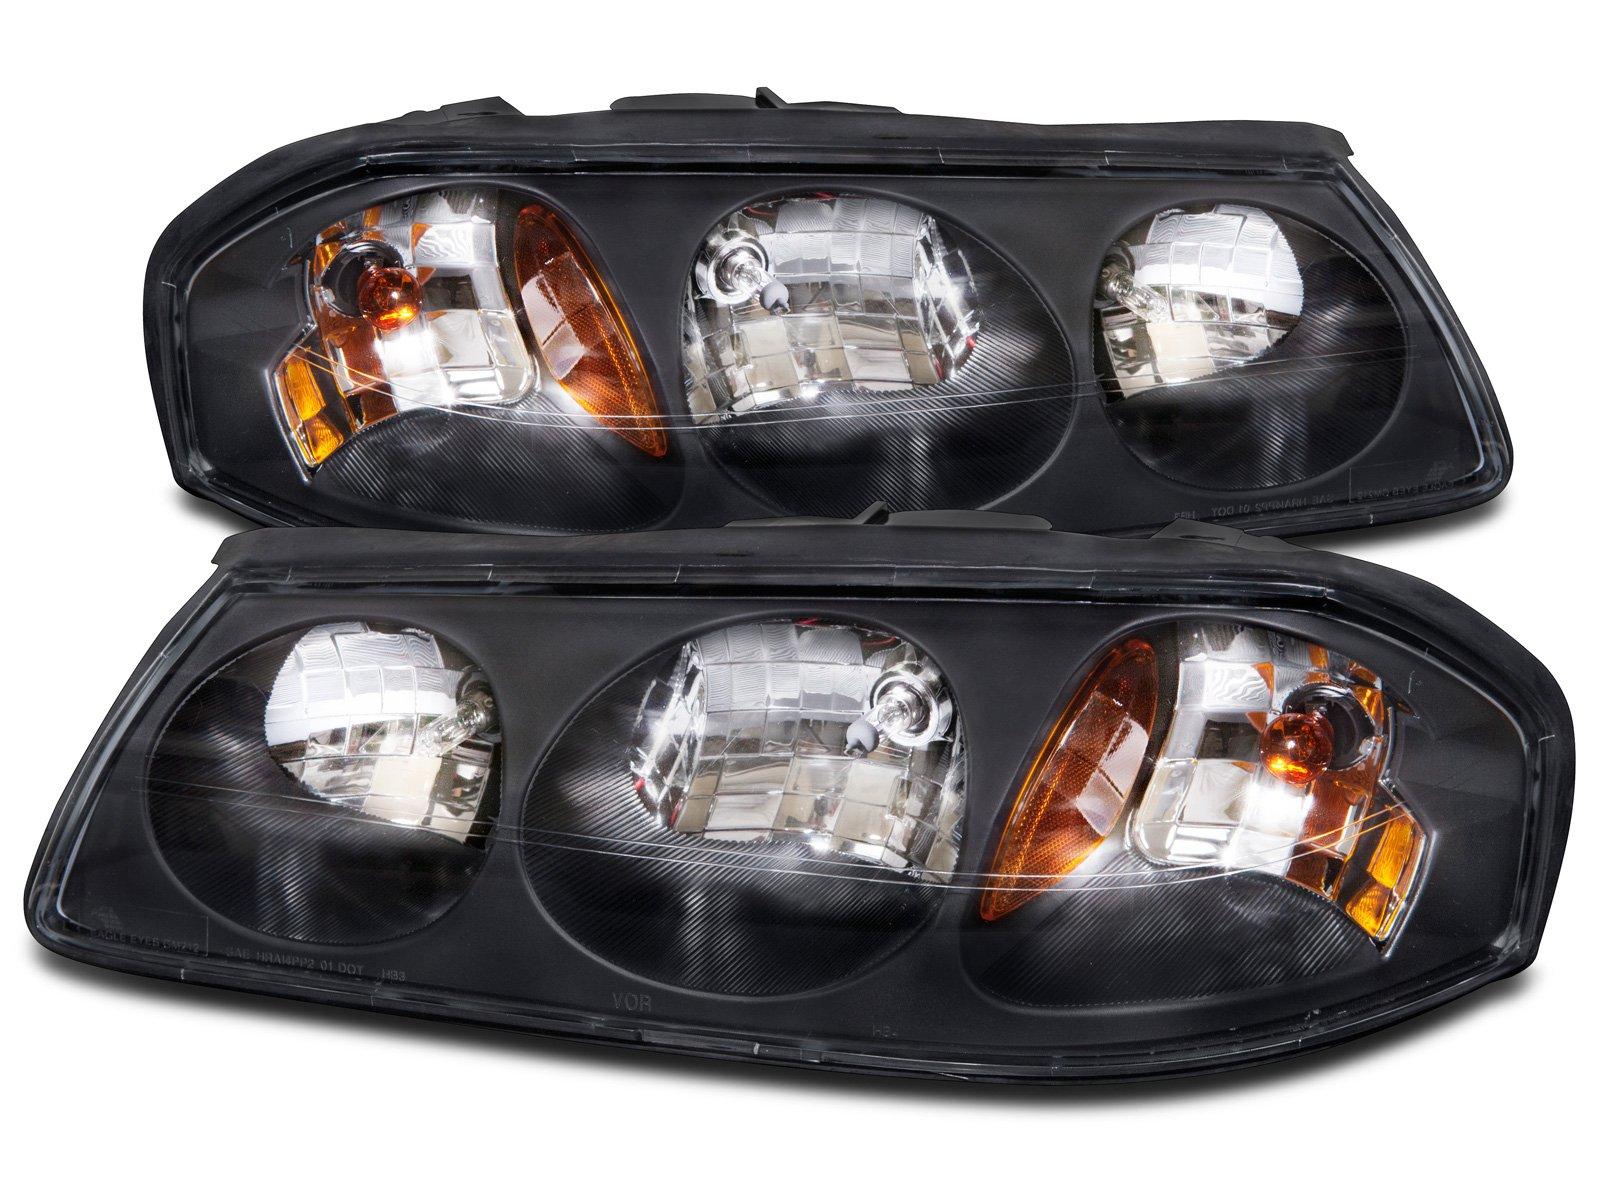 HEADLIGHTSDEPOT RV Headlights Compatible with Winnebago Adventurer 03-05 Includes Left Driver and Right Passenger Side Headlamps